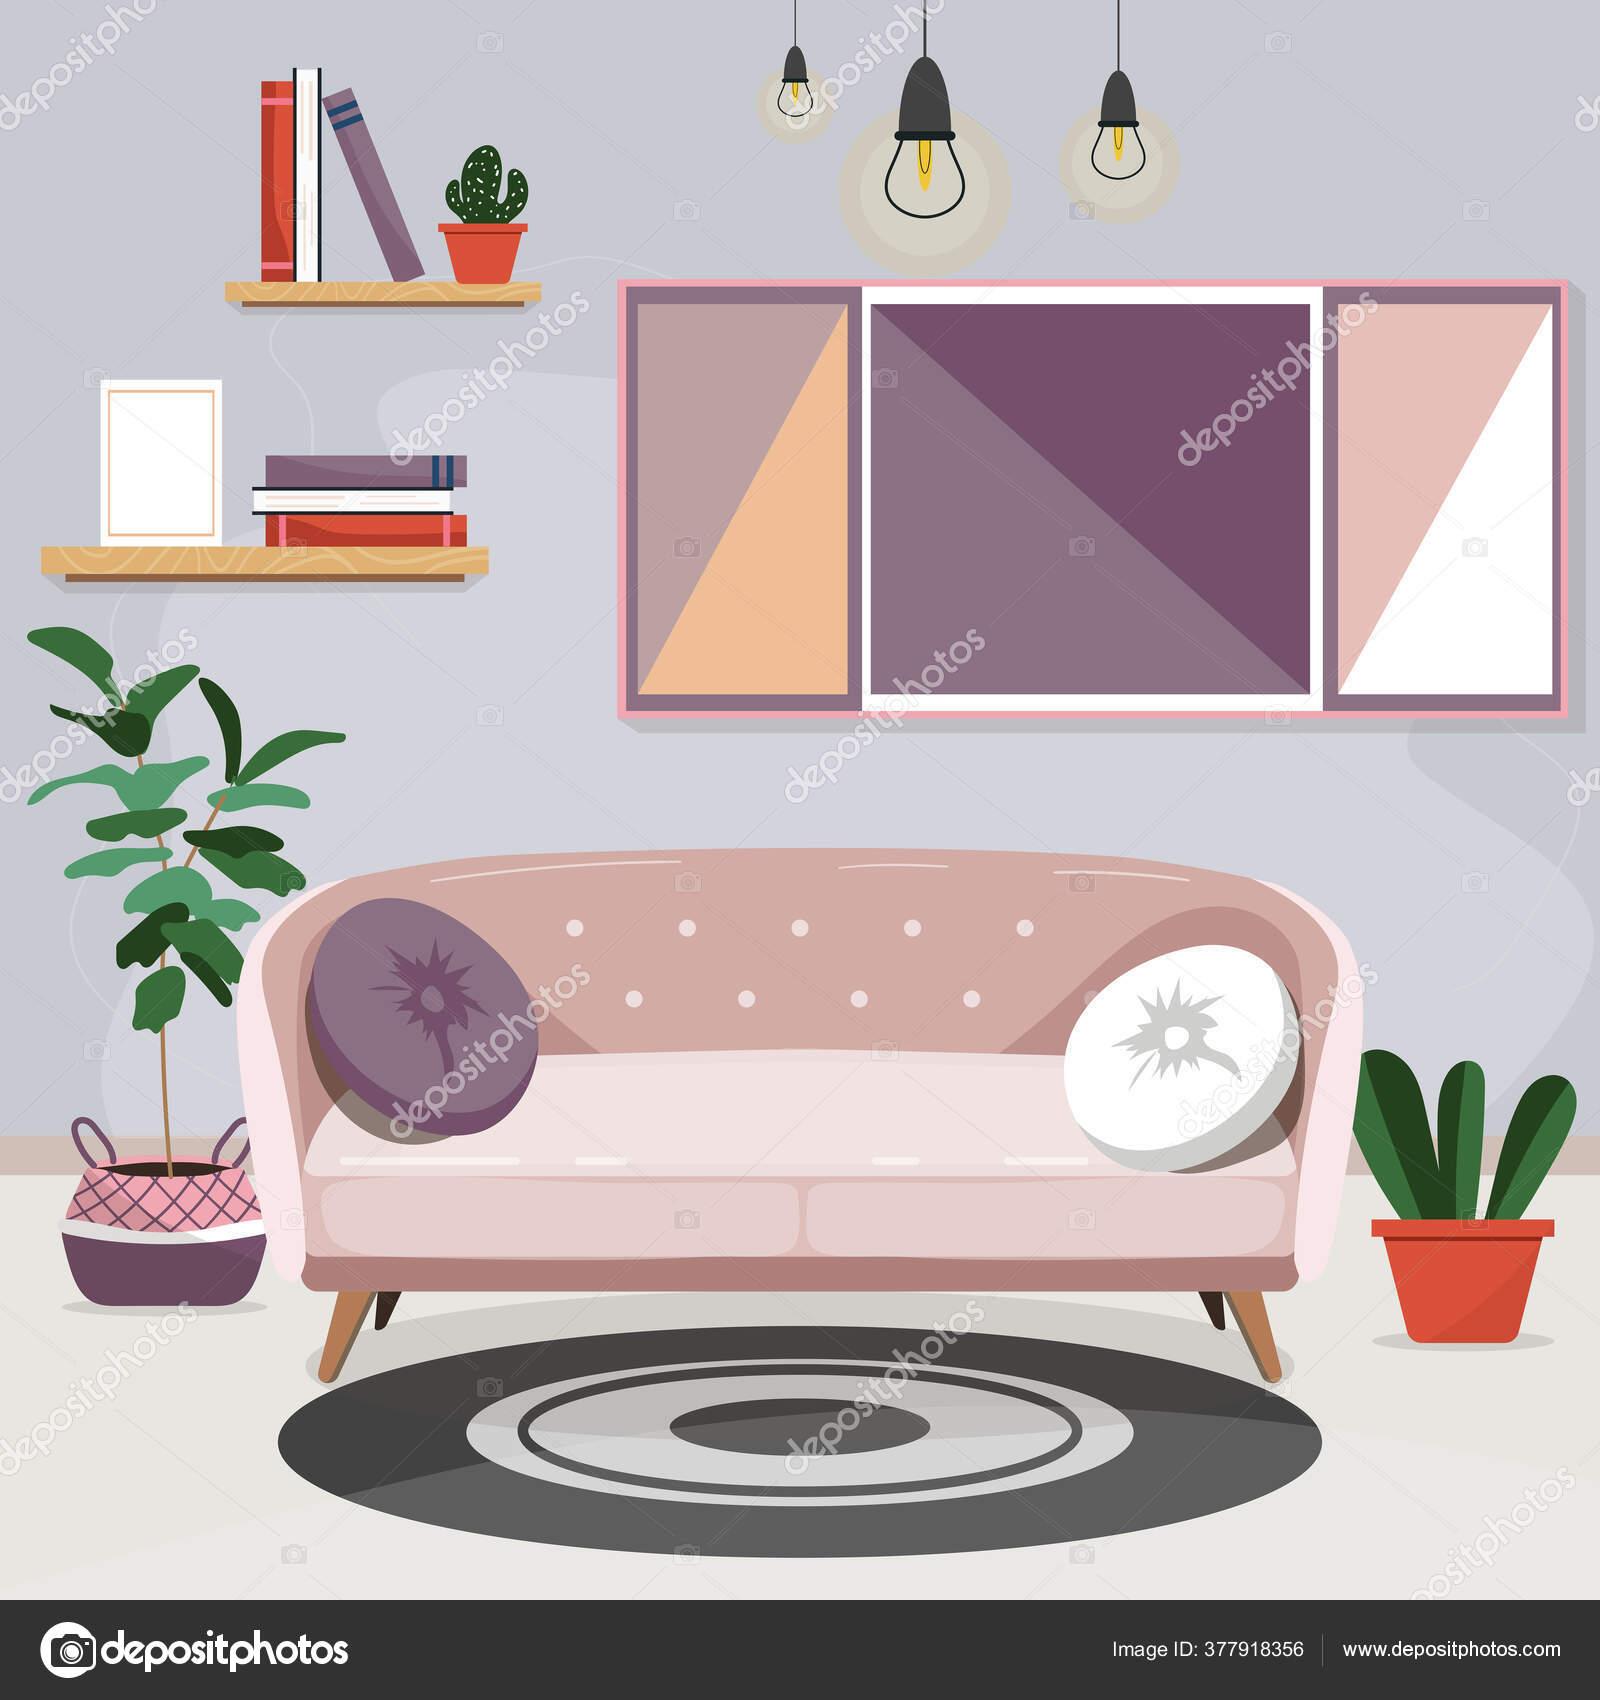 Home Interior Cozy Living Room Light Pink Sofa Pillows Shelves Stock Vector C Julievanhaber 377918356